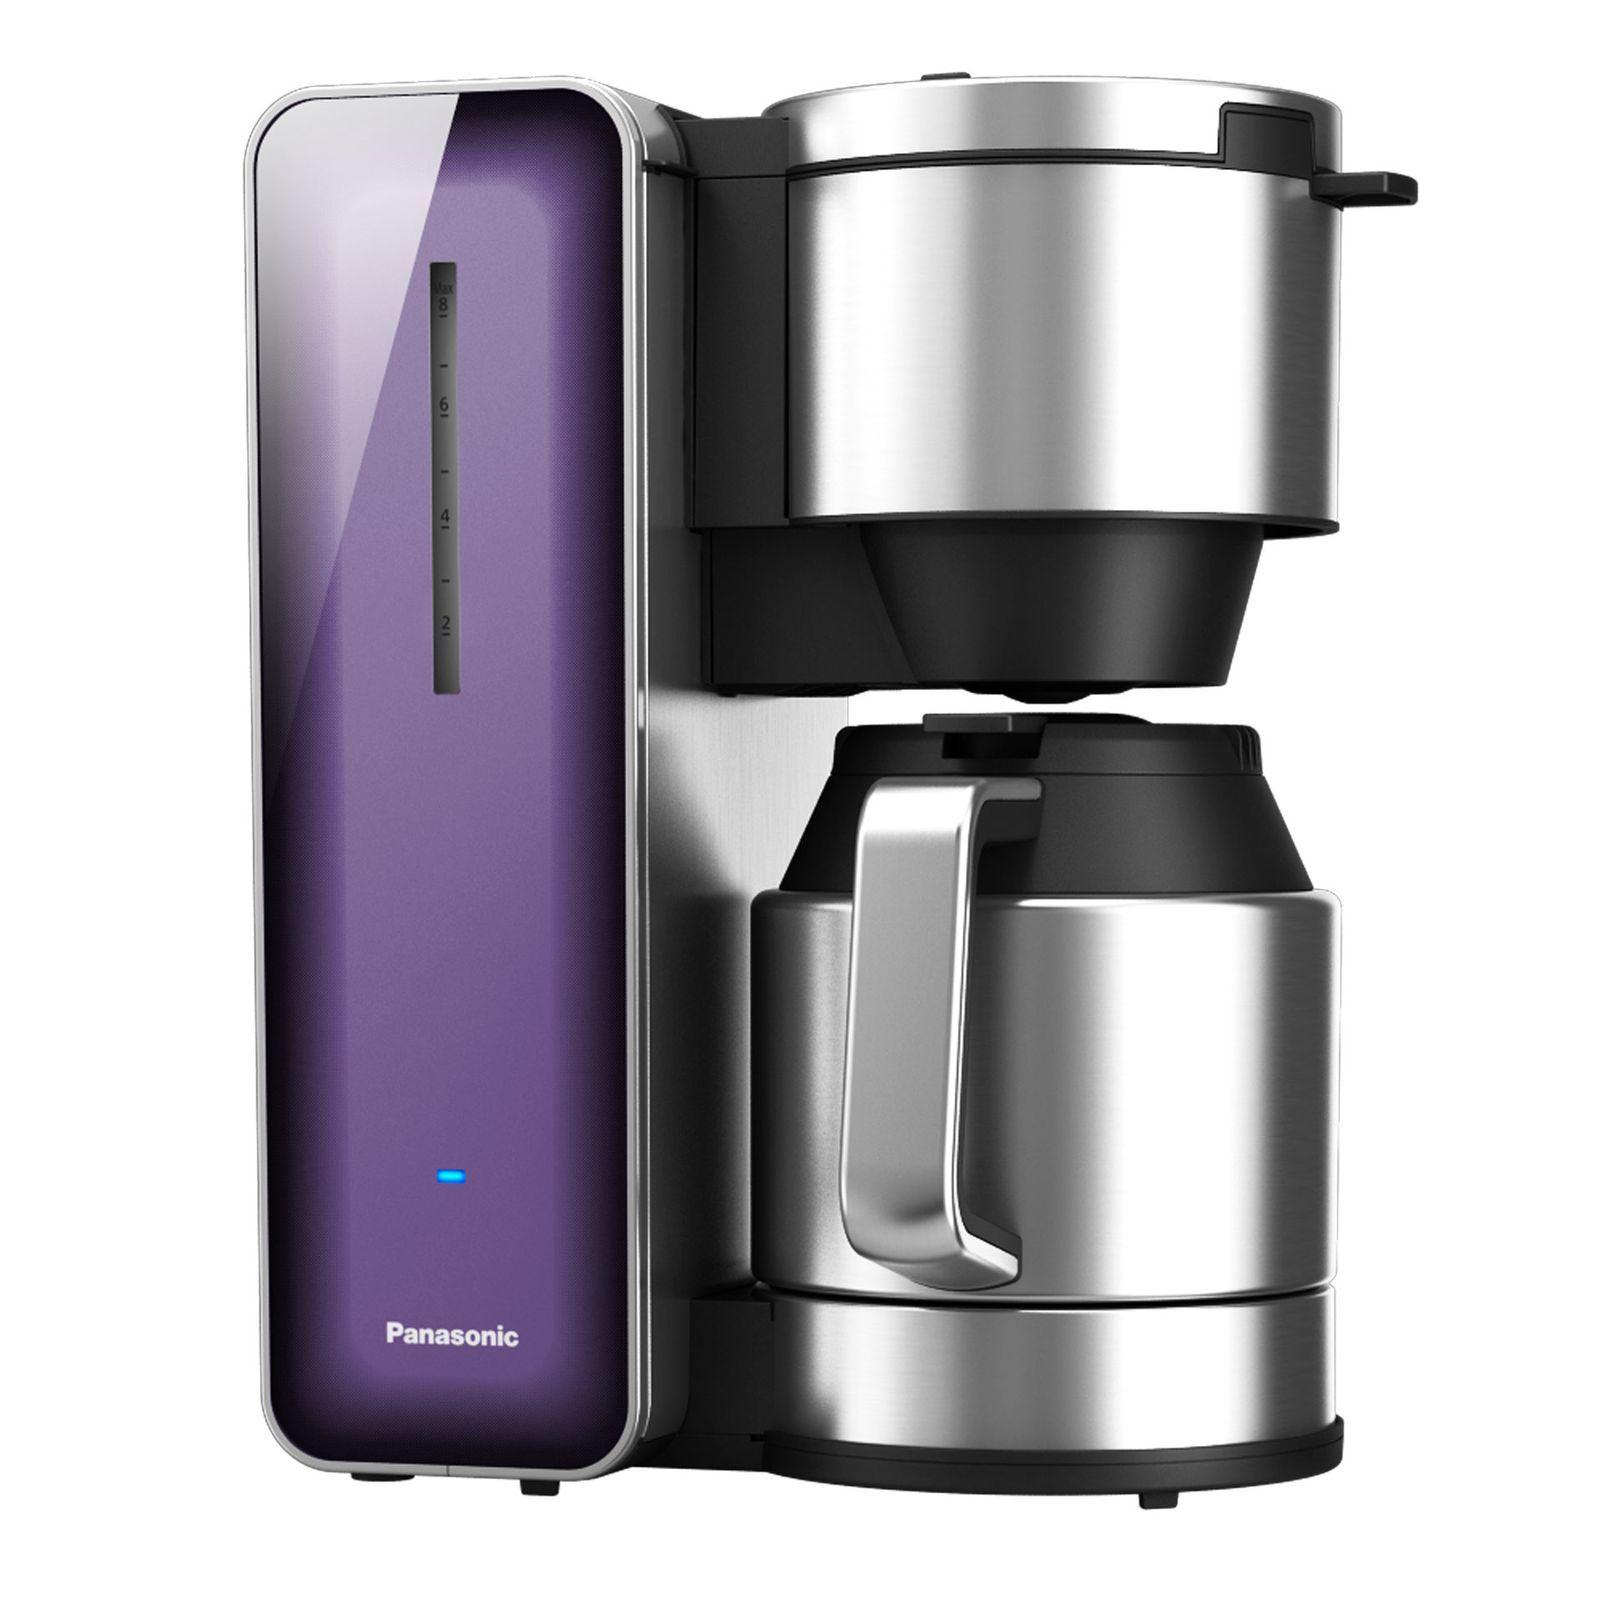 Panasonic The Breakfast Collection Coffee Maker NCZF1